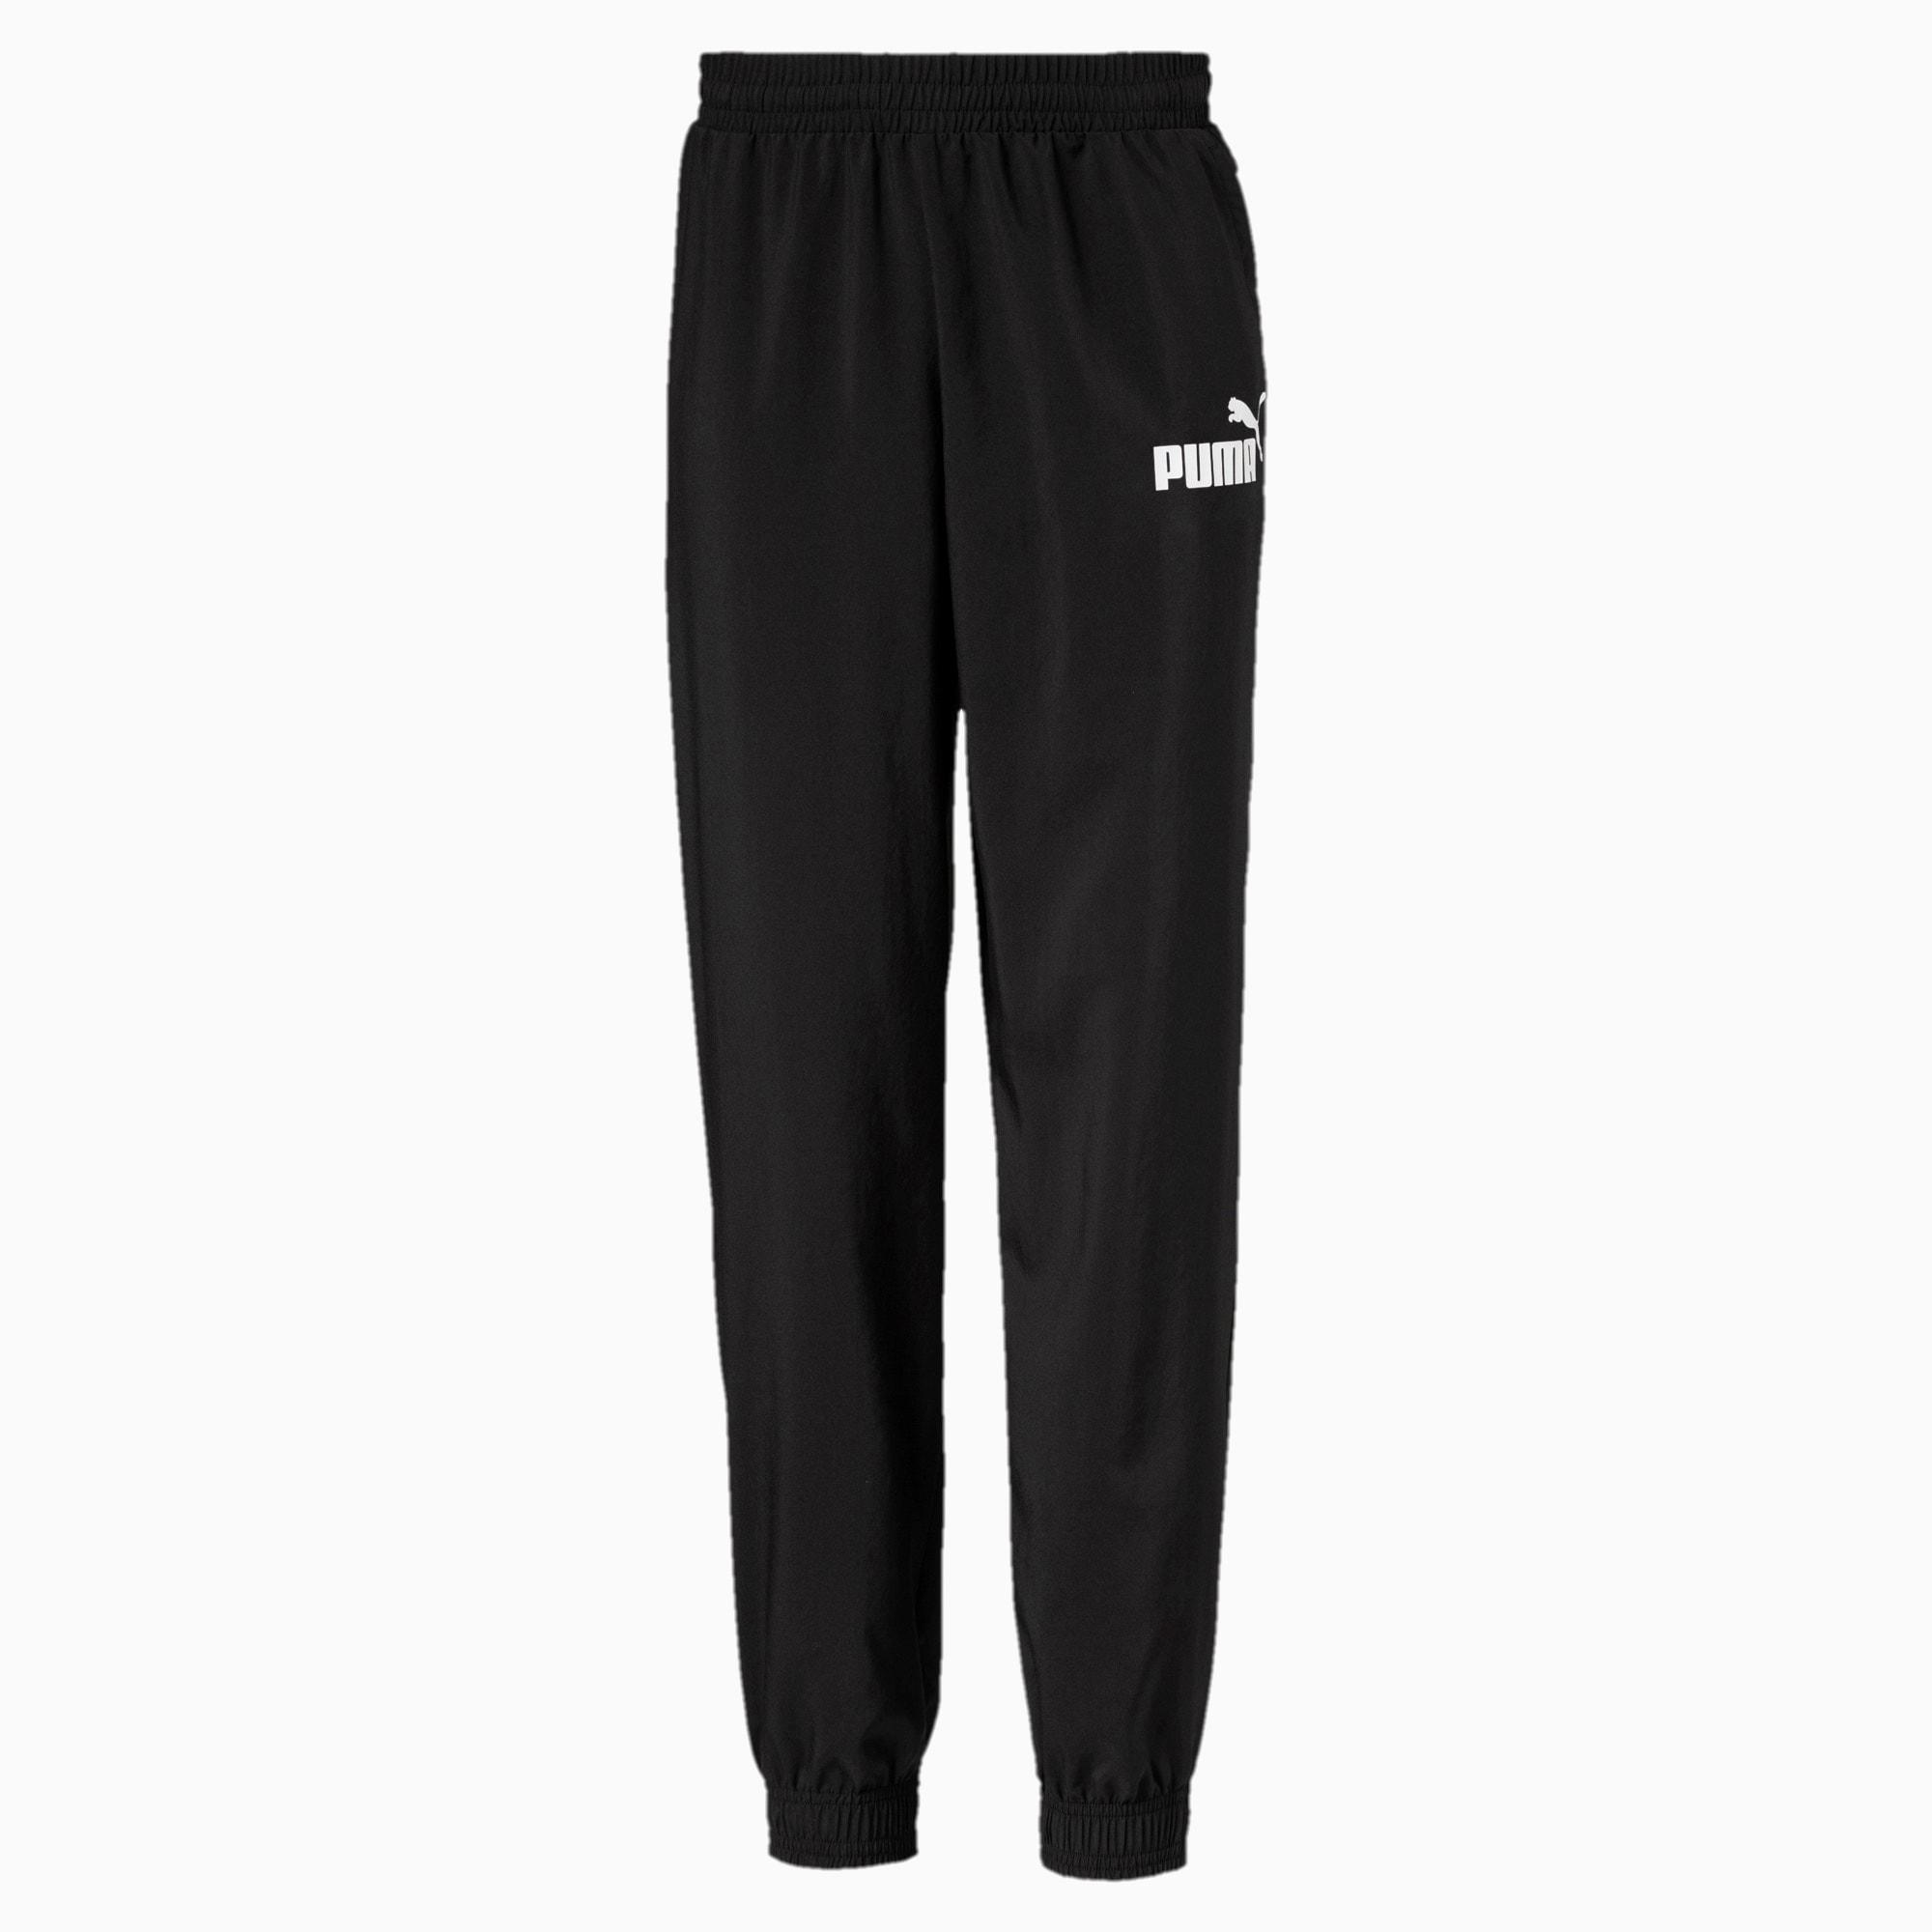 Essentials Woven Boys' Track Pants